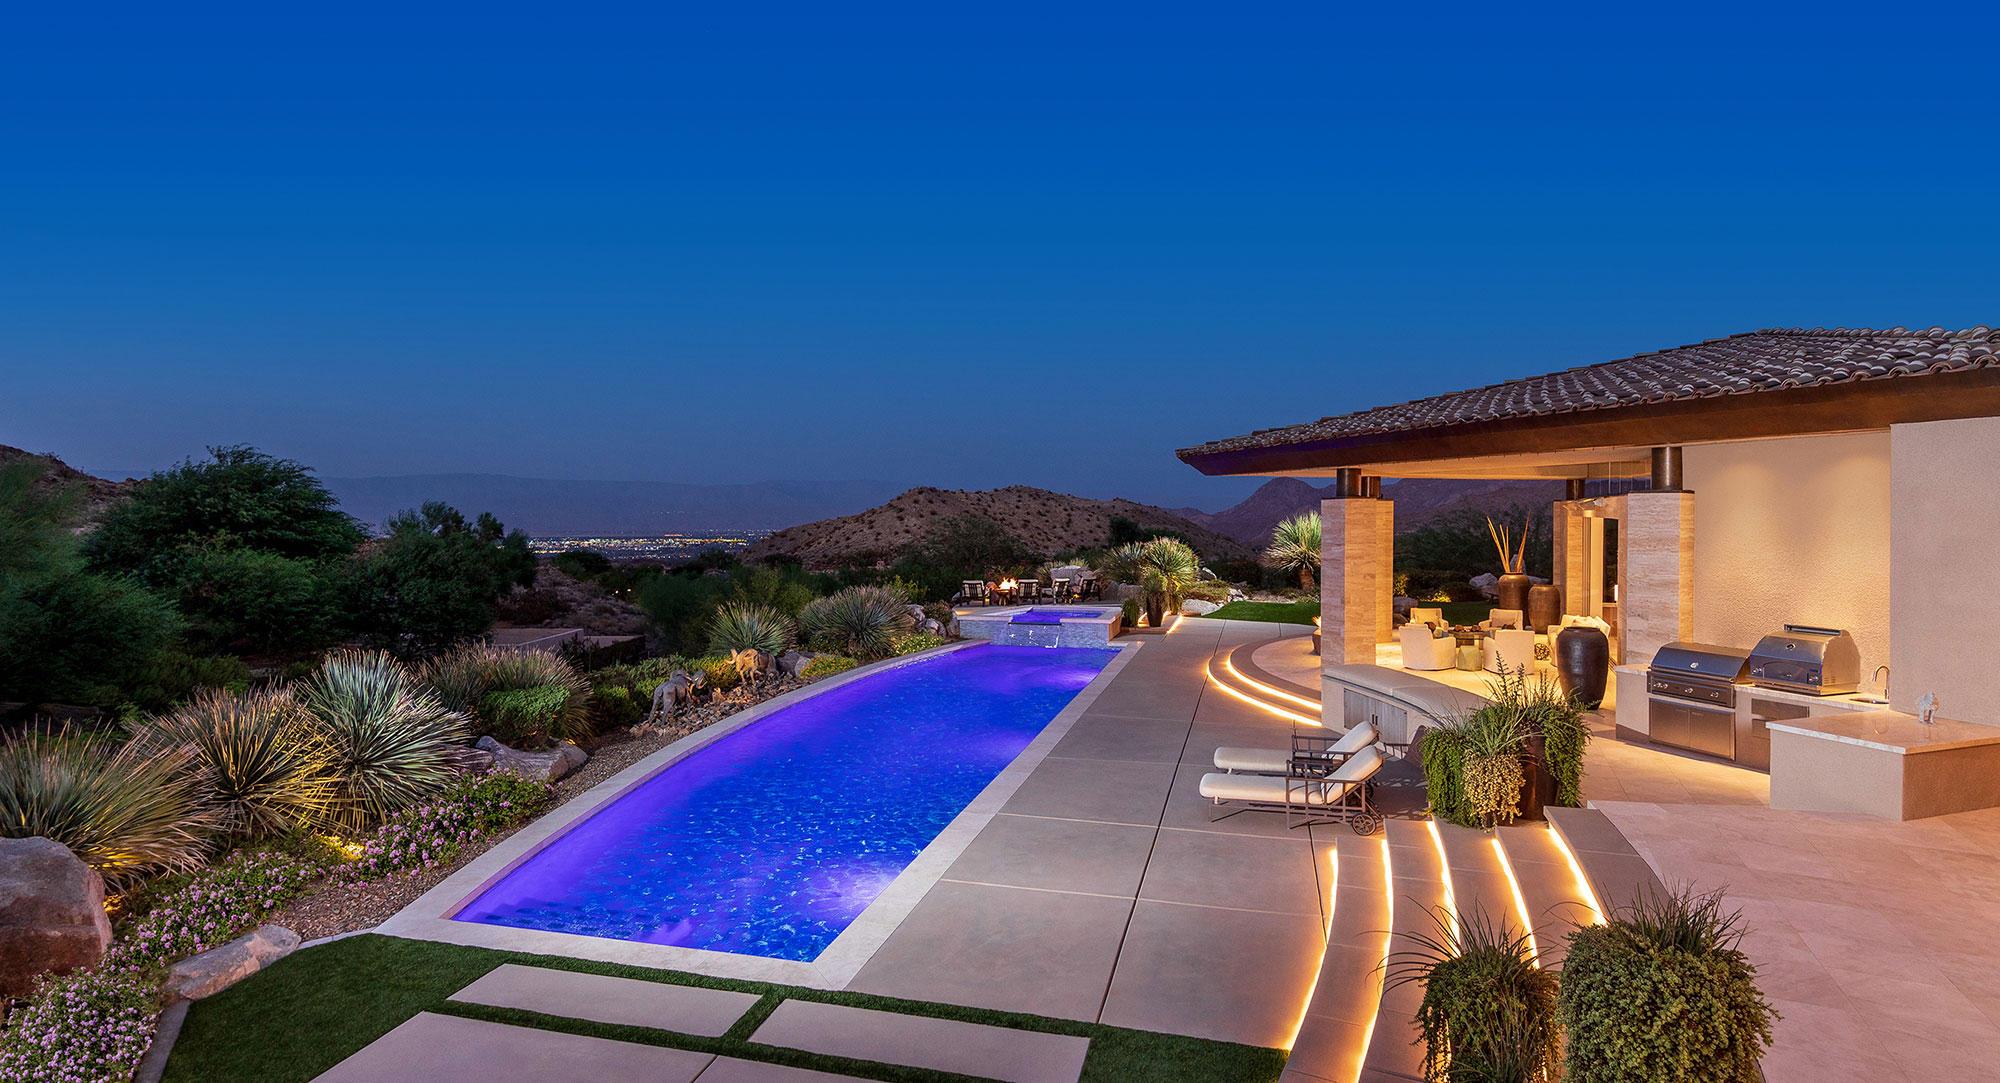 113 Tepin Way, Palm Desert, CA 92260